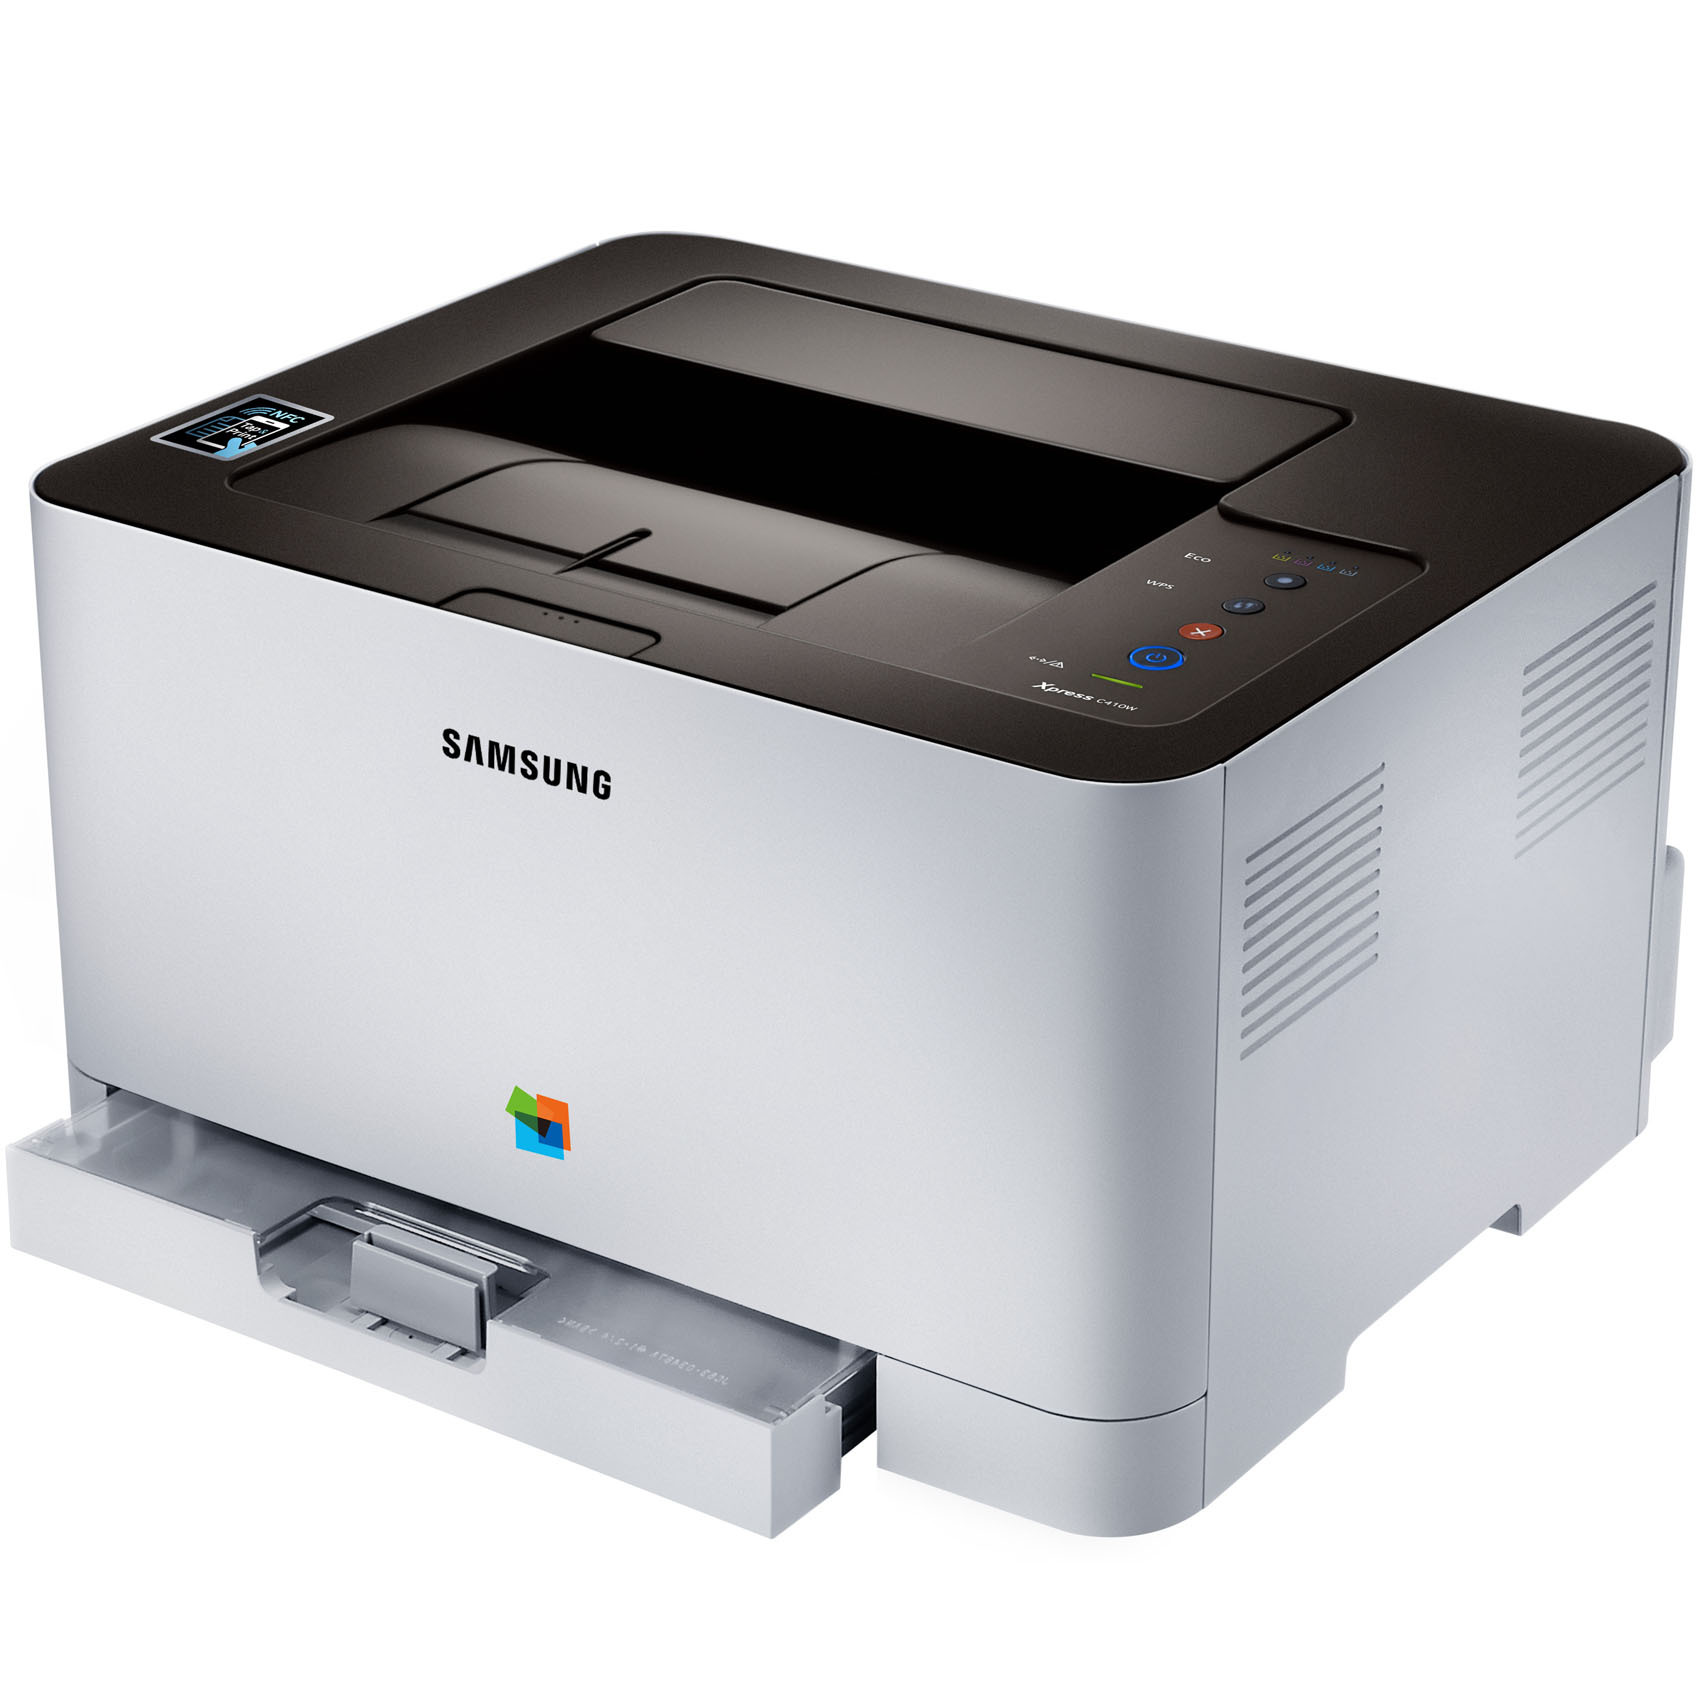 SAMSUNG PRINT LSR WIFI SLC-430W